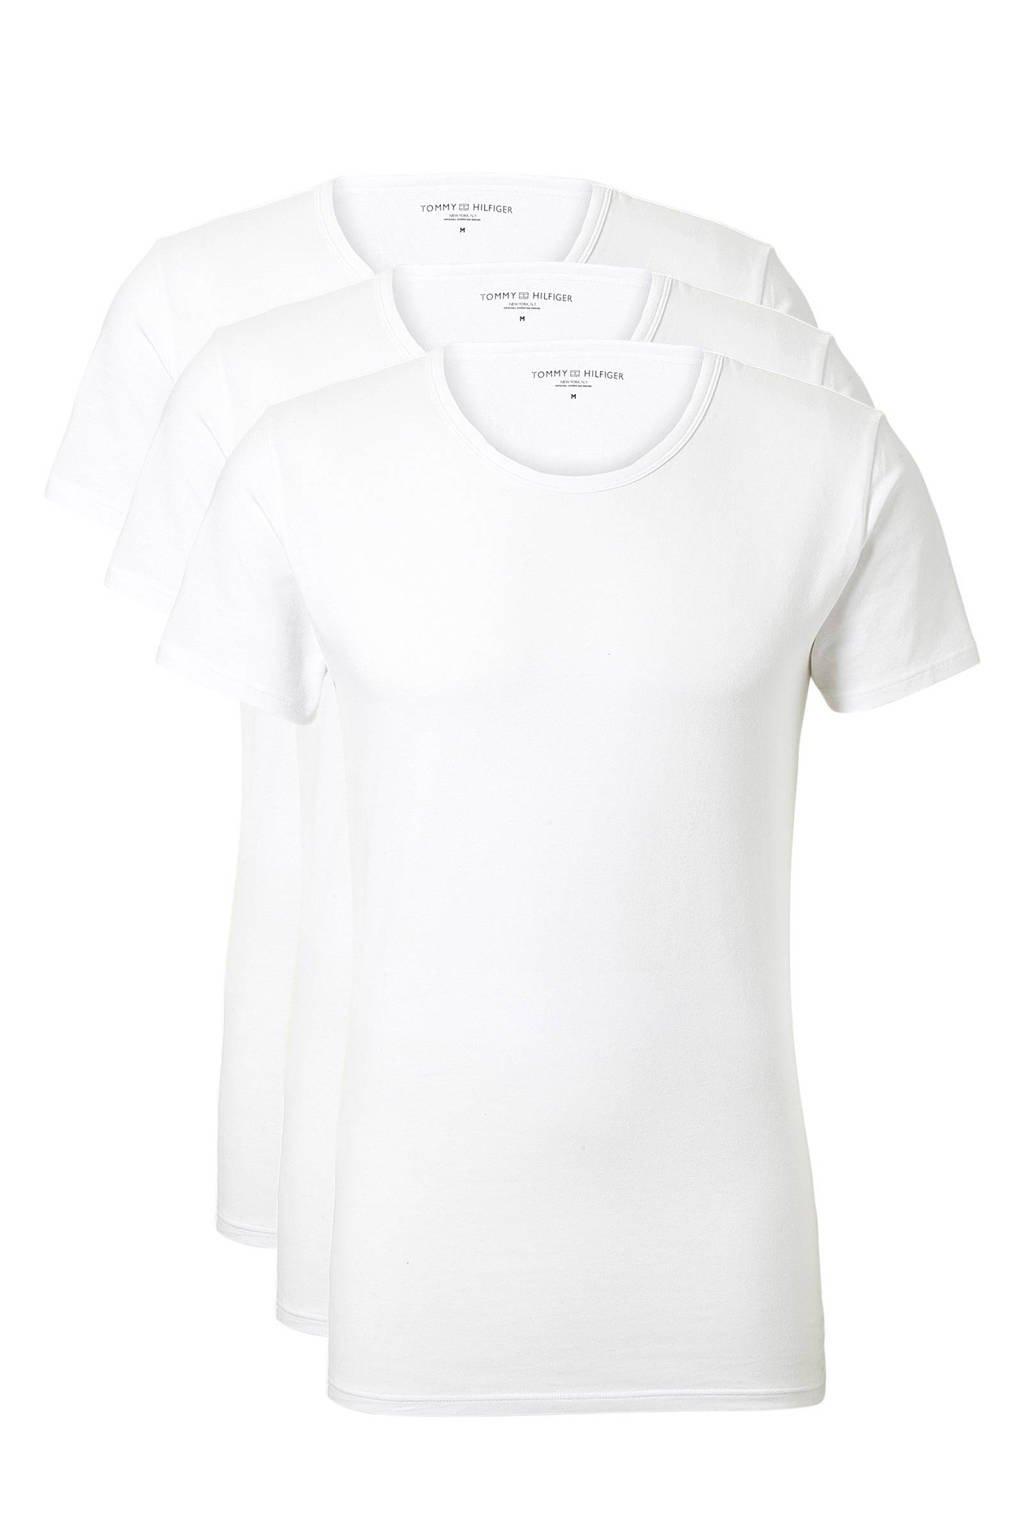 Tommy Hilfiger T-shirt (set van 3), Wit